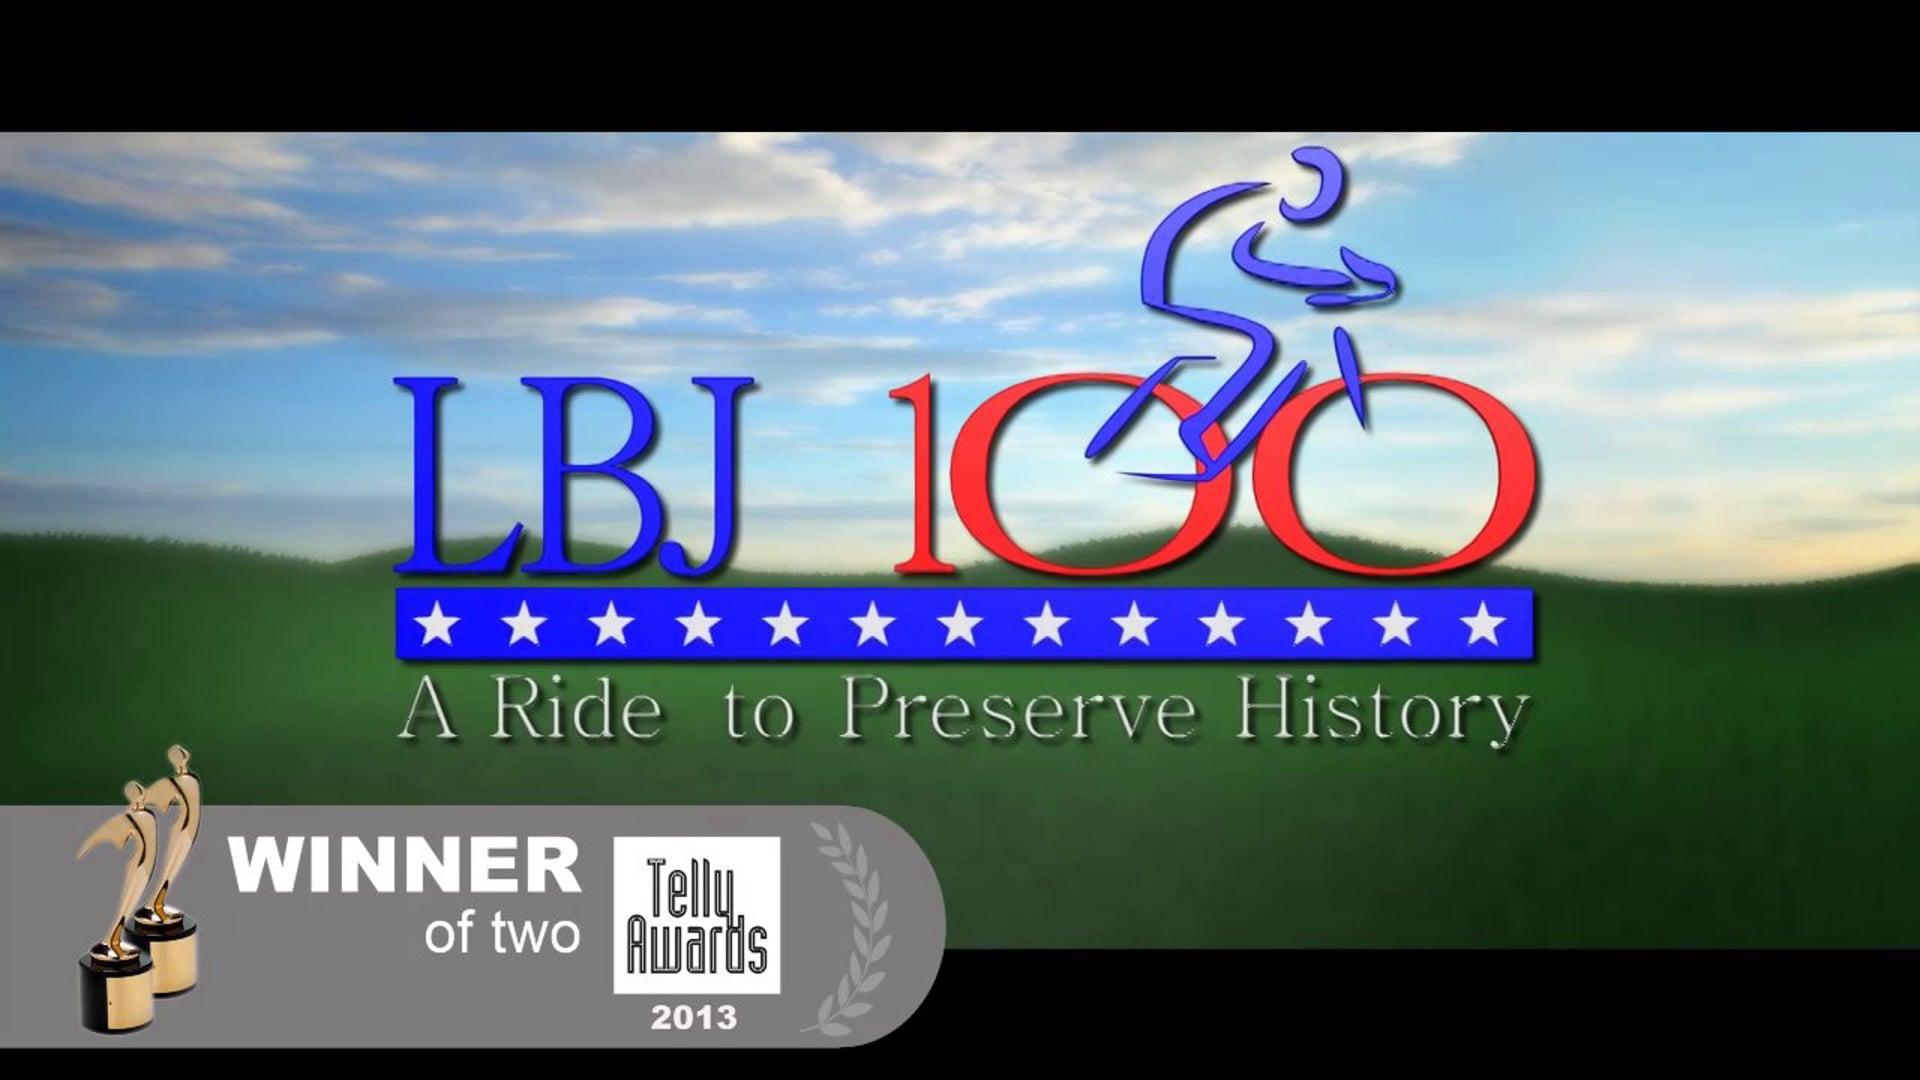 LBJ 100 Bicycle Tour: 2013 Promotional Film